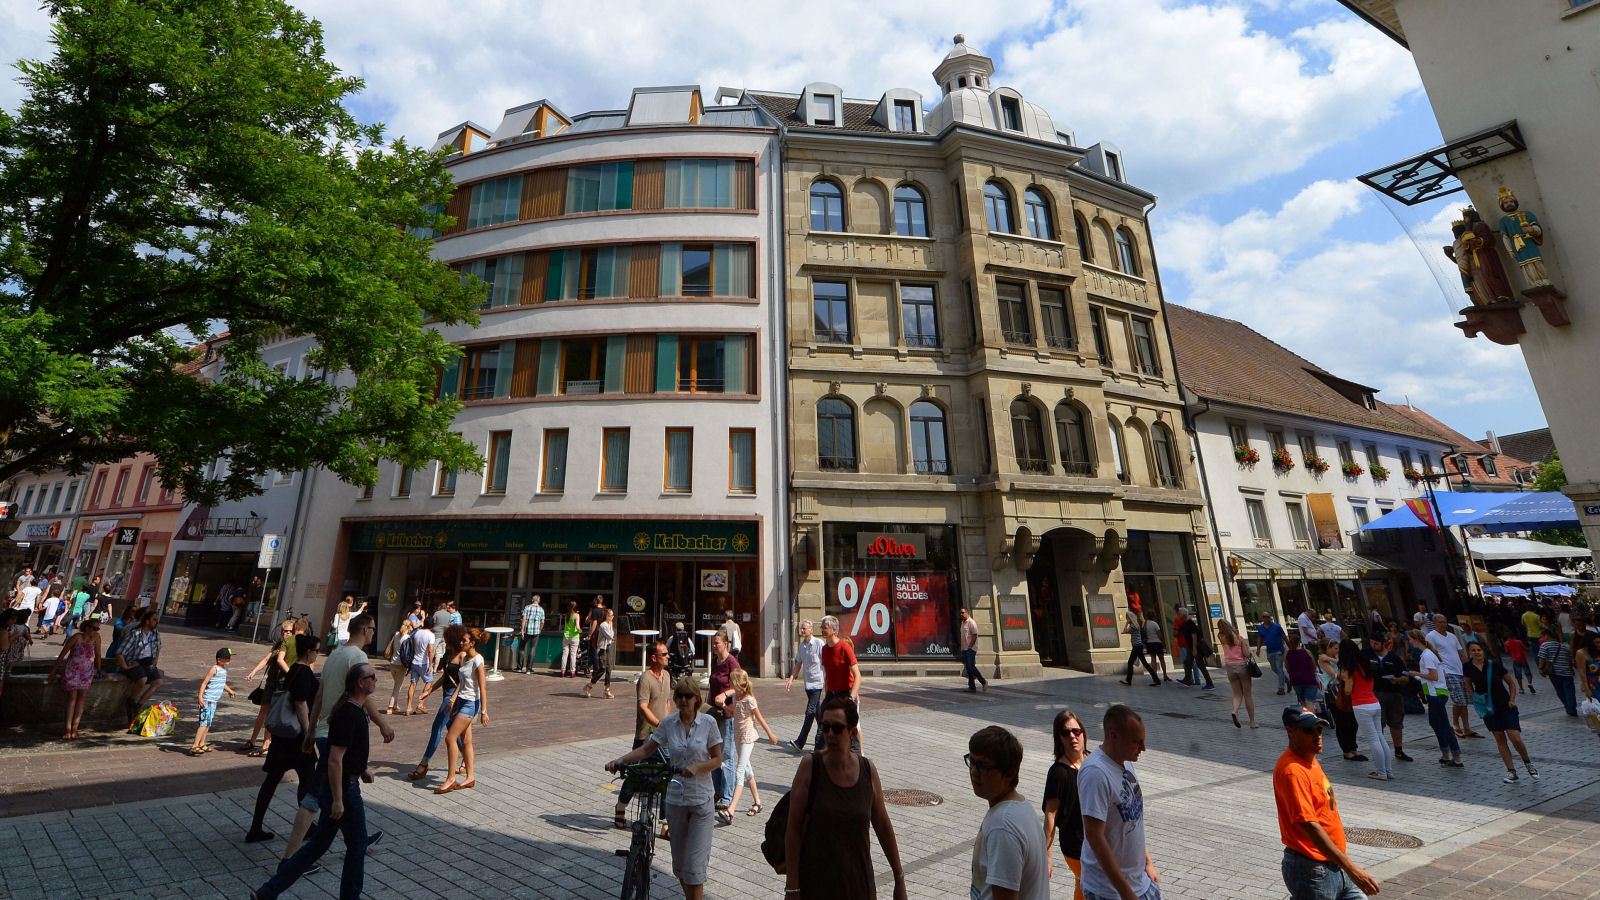 Stadt Lörrach - Fußgängerzone / Copyright by Juri JunkovPublikation